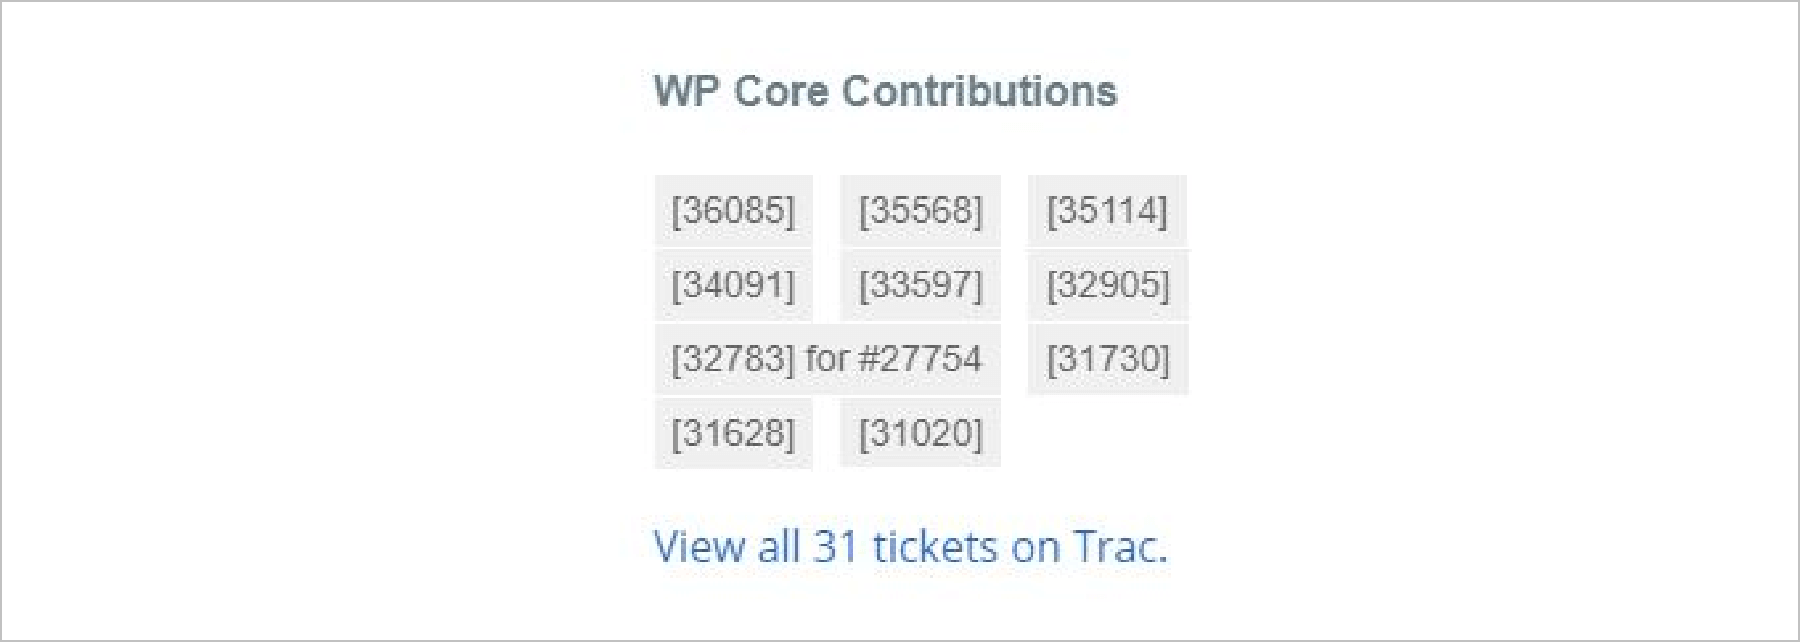 wp-core-contributions